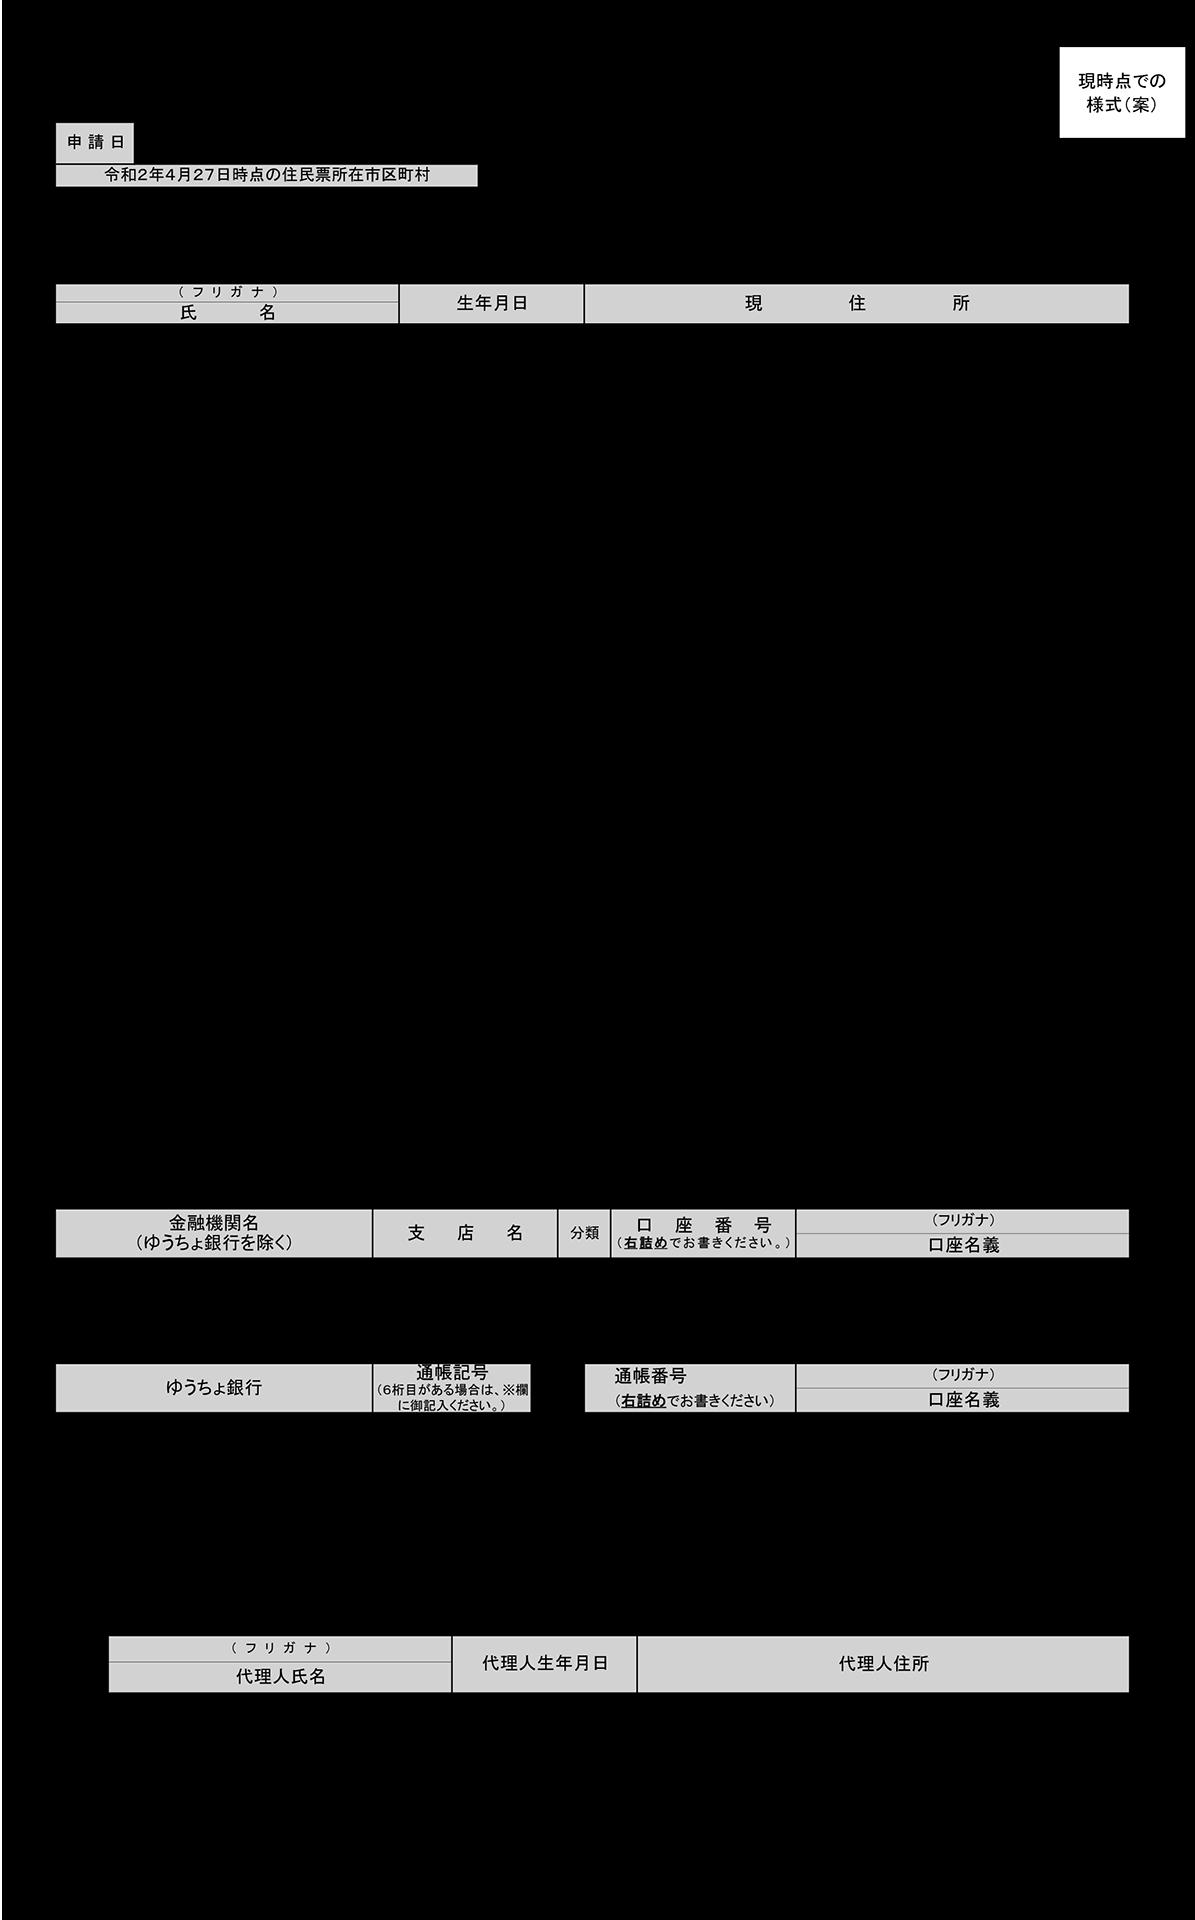 "特別定額給付金申請書の例(<a href=""https://www.soumu.go.jp/menu_news/s-news/01zaisei02_02000250.html"">総務省発表資料から</a>)"